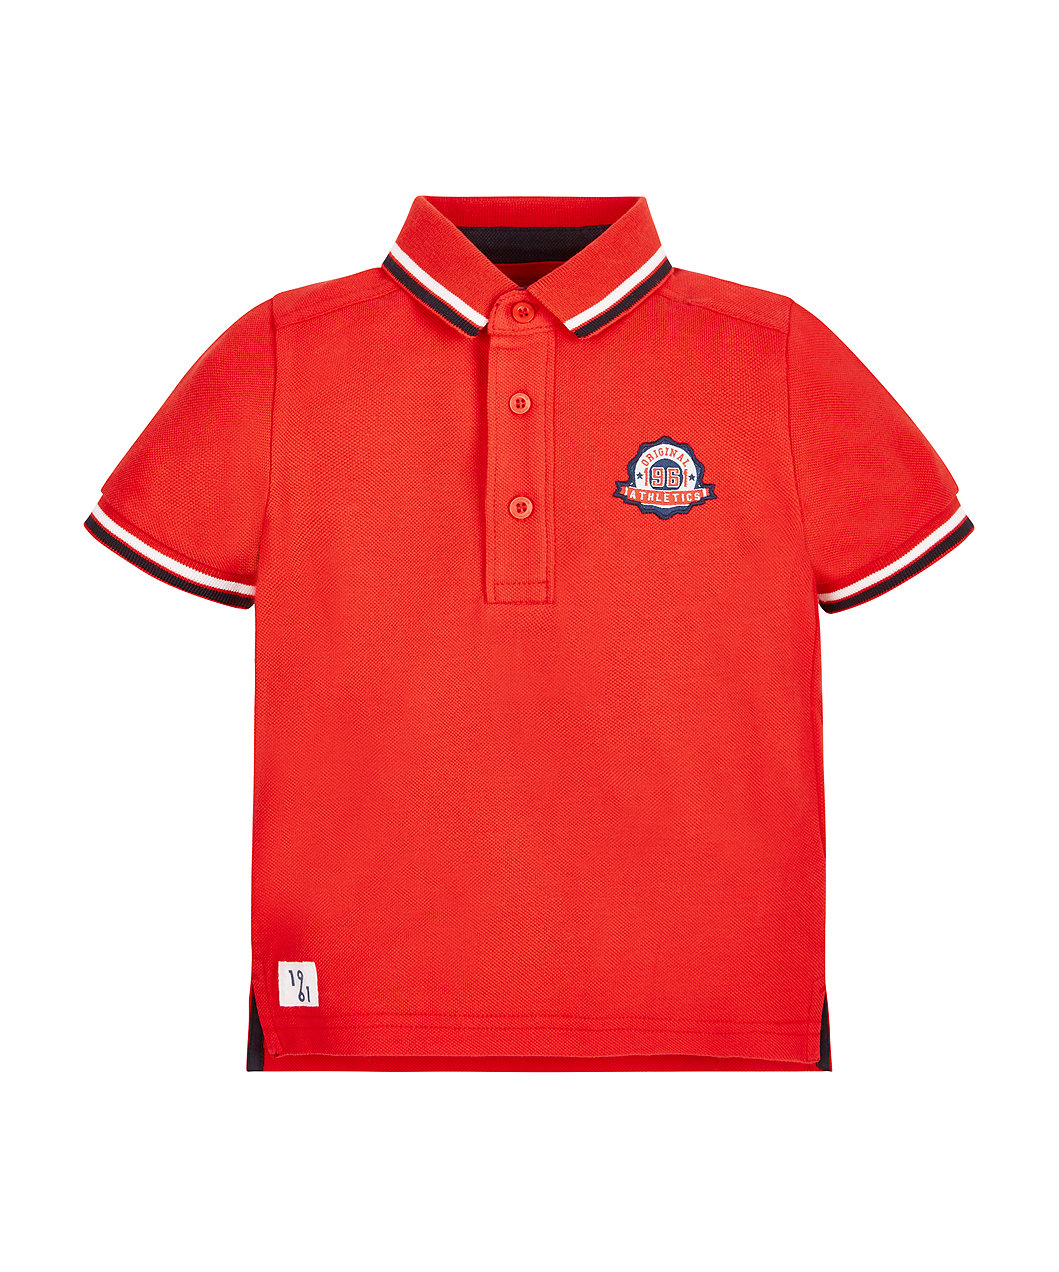 Athletics Polo Shirt Clothing Boys Sale